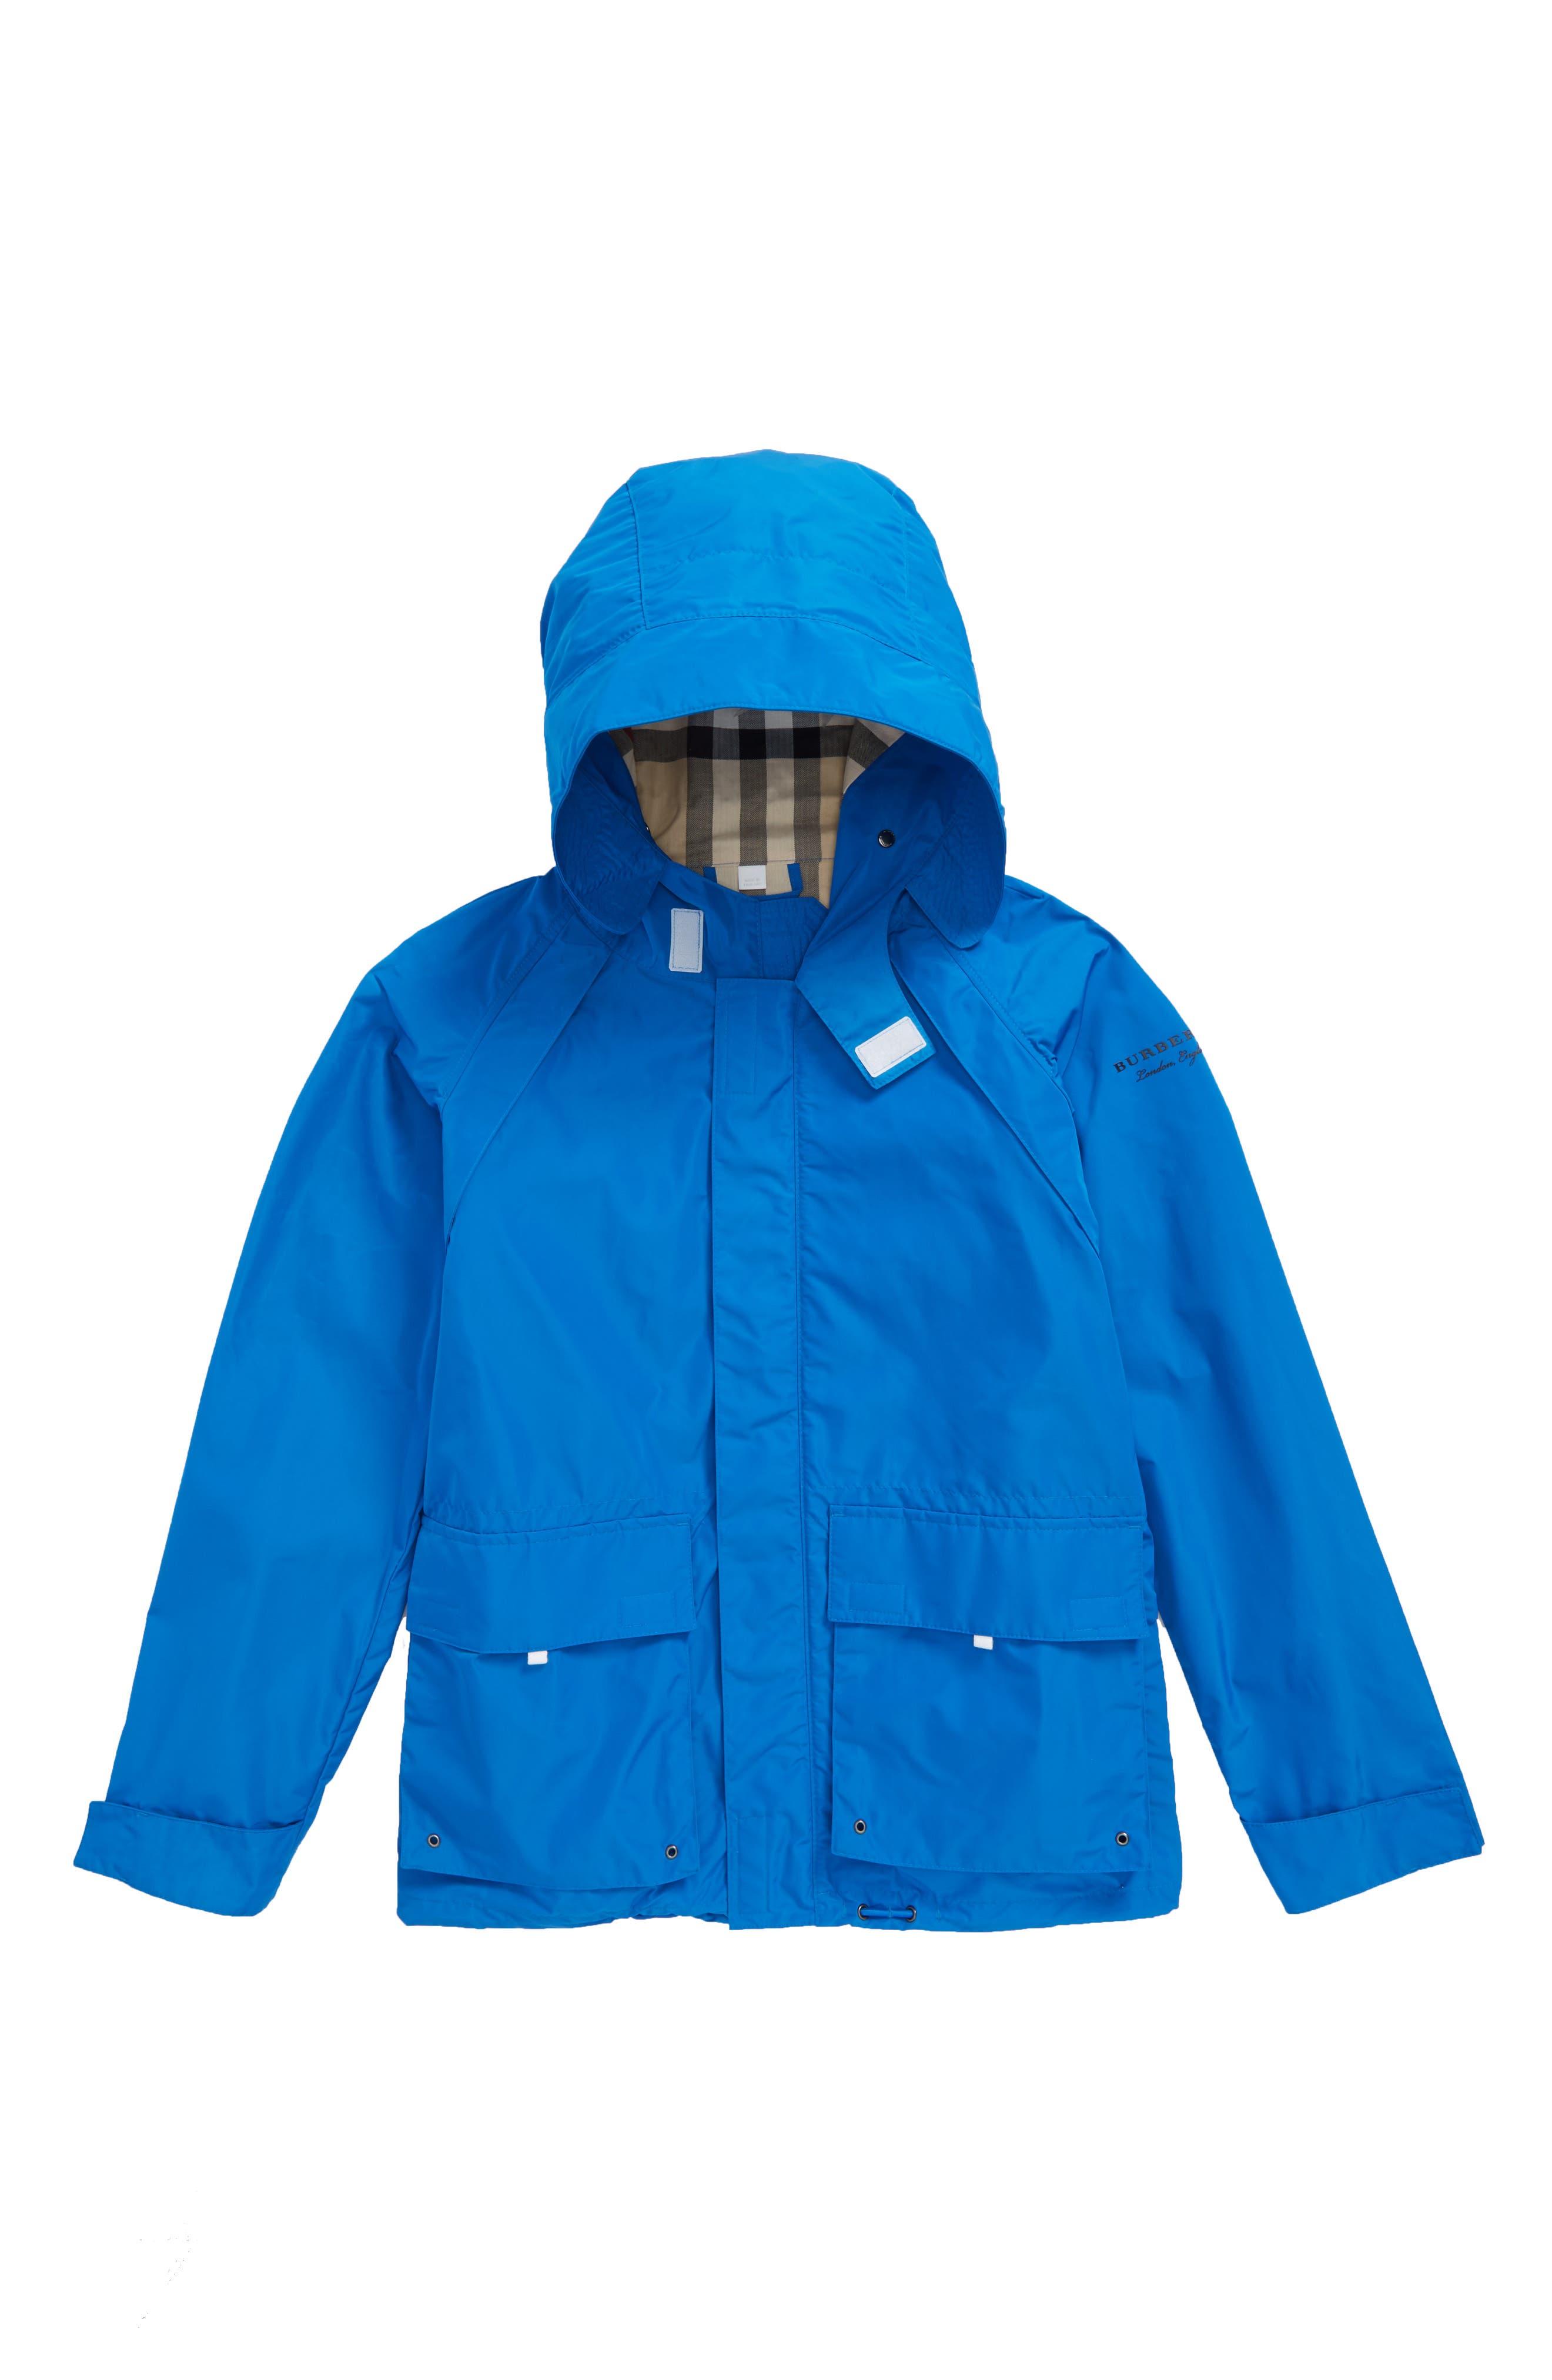 Yately Waterproof Field Jacket,                             Main thumbnail 1, color,                             Azure Blue